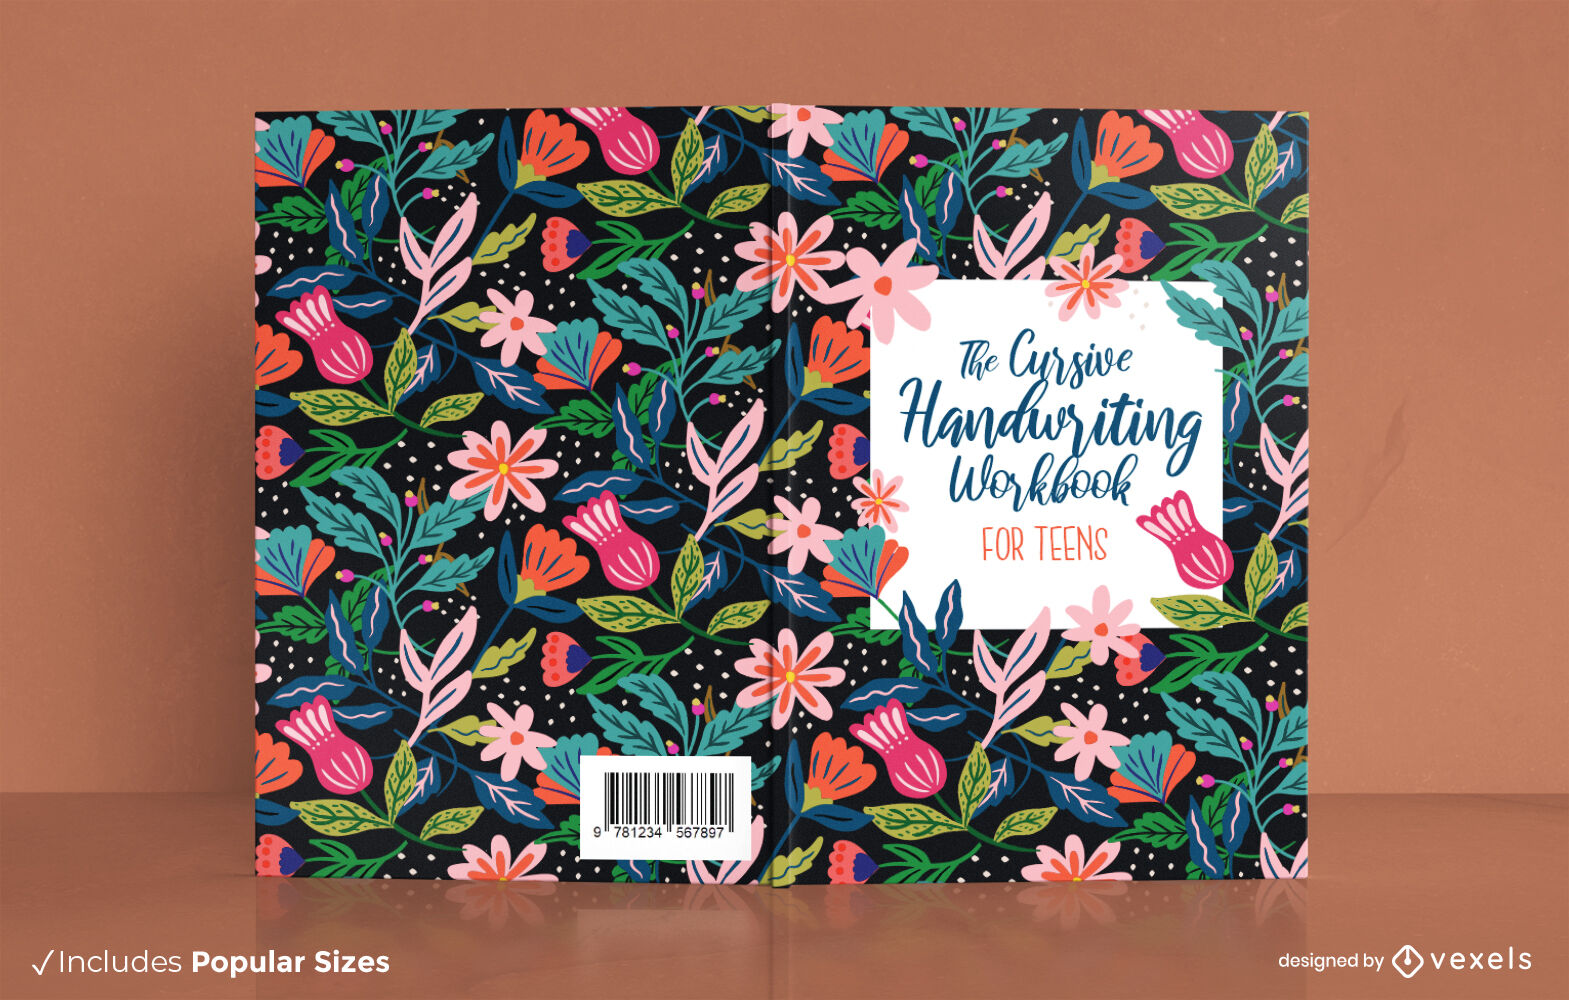 Cursive handwriting floral book cover design